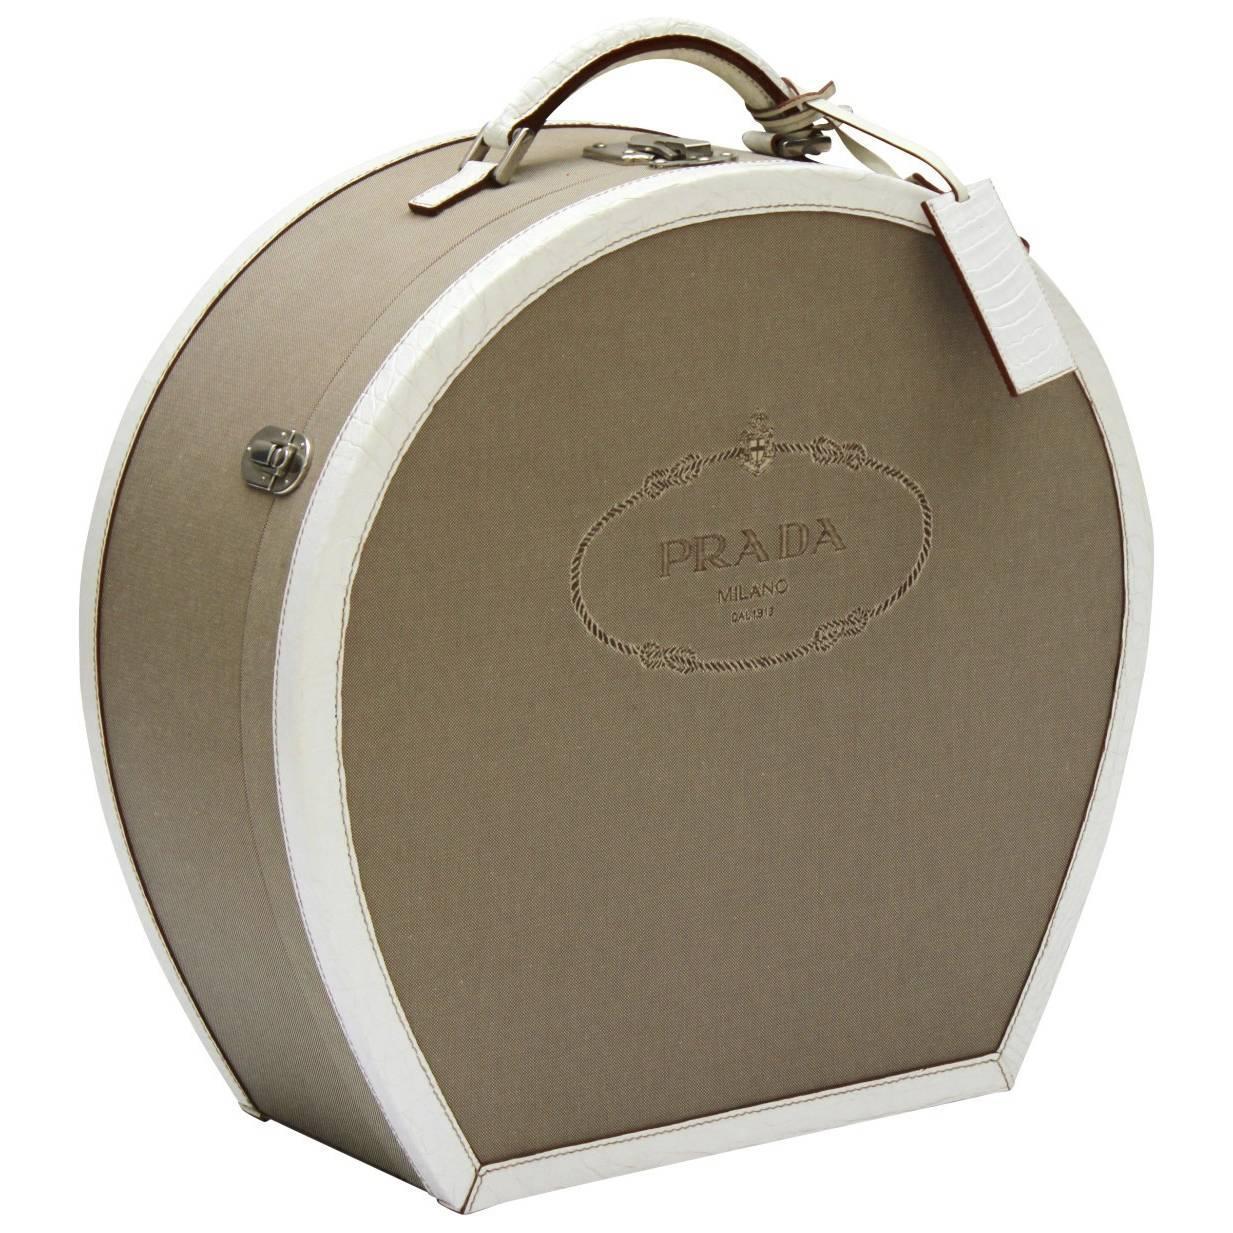 Vintage Inspired Prada Hatbox Made In 2012